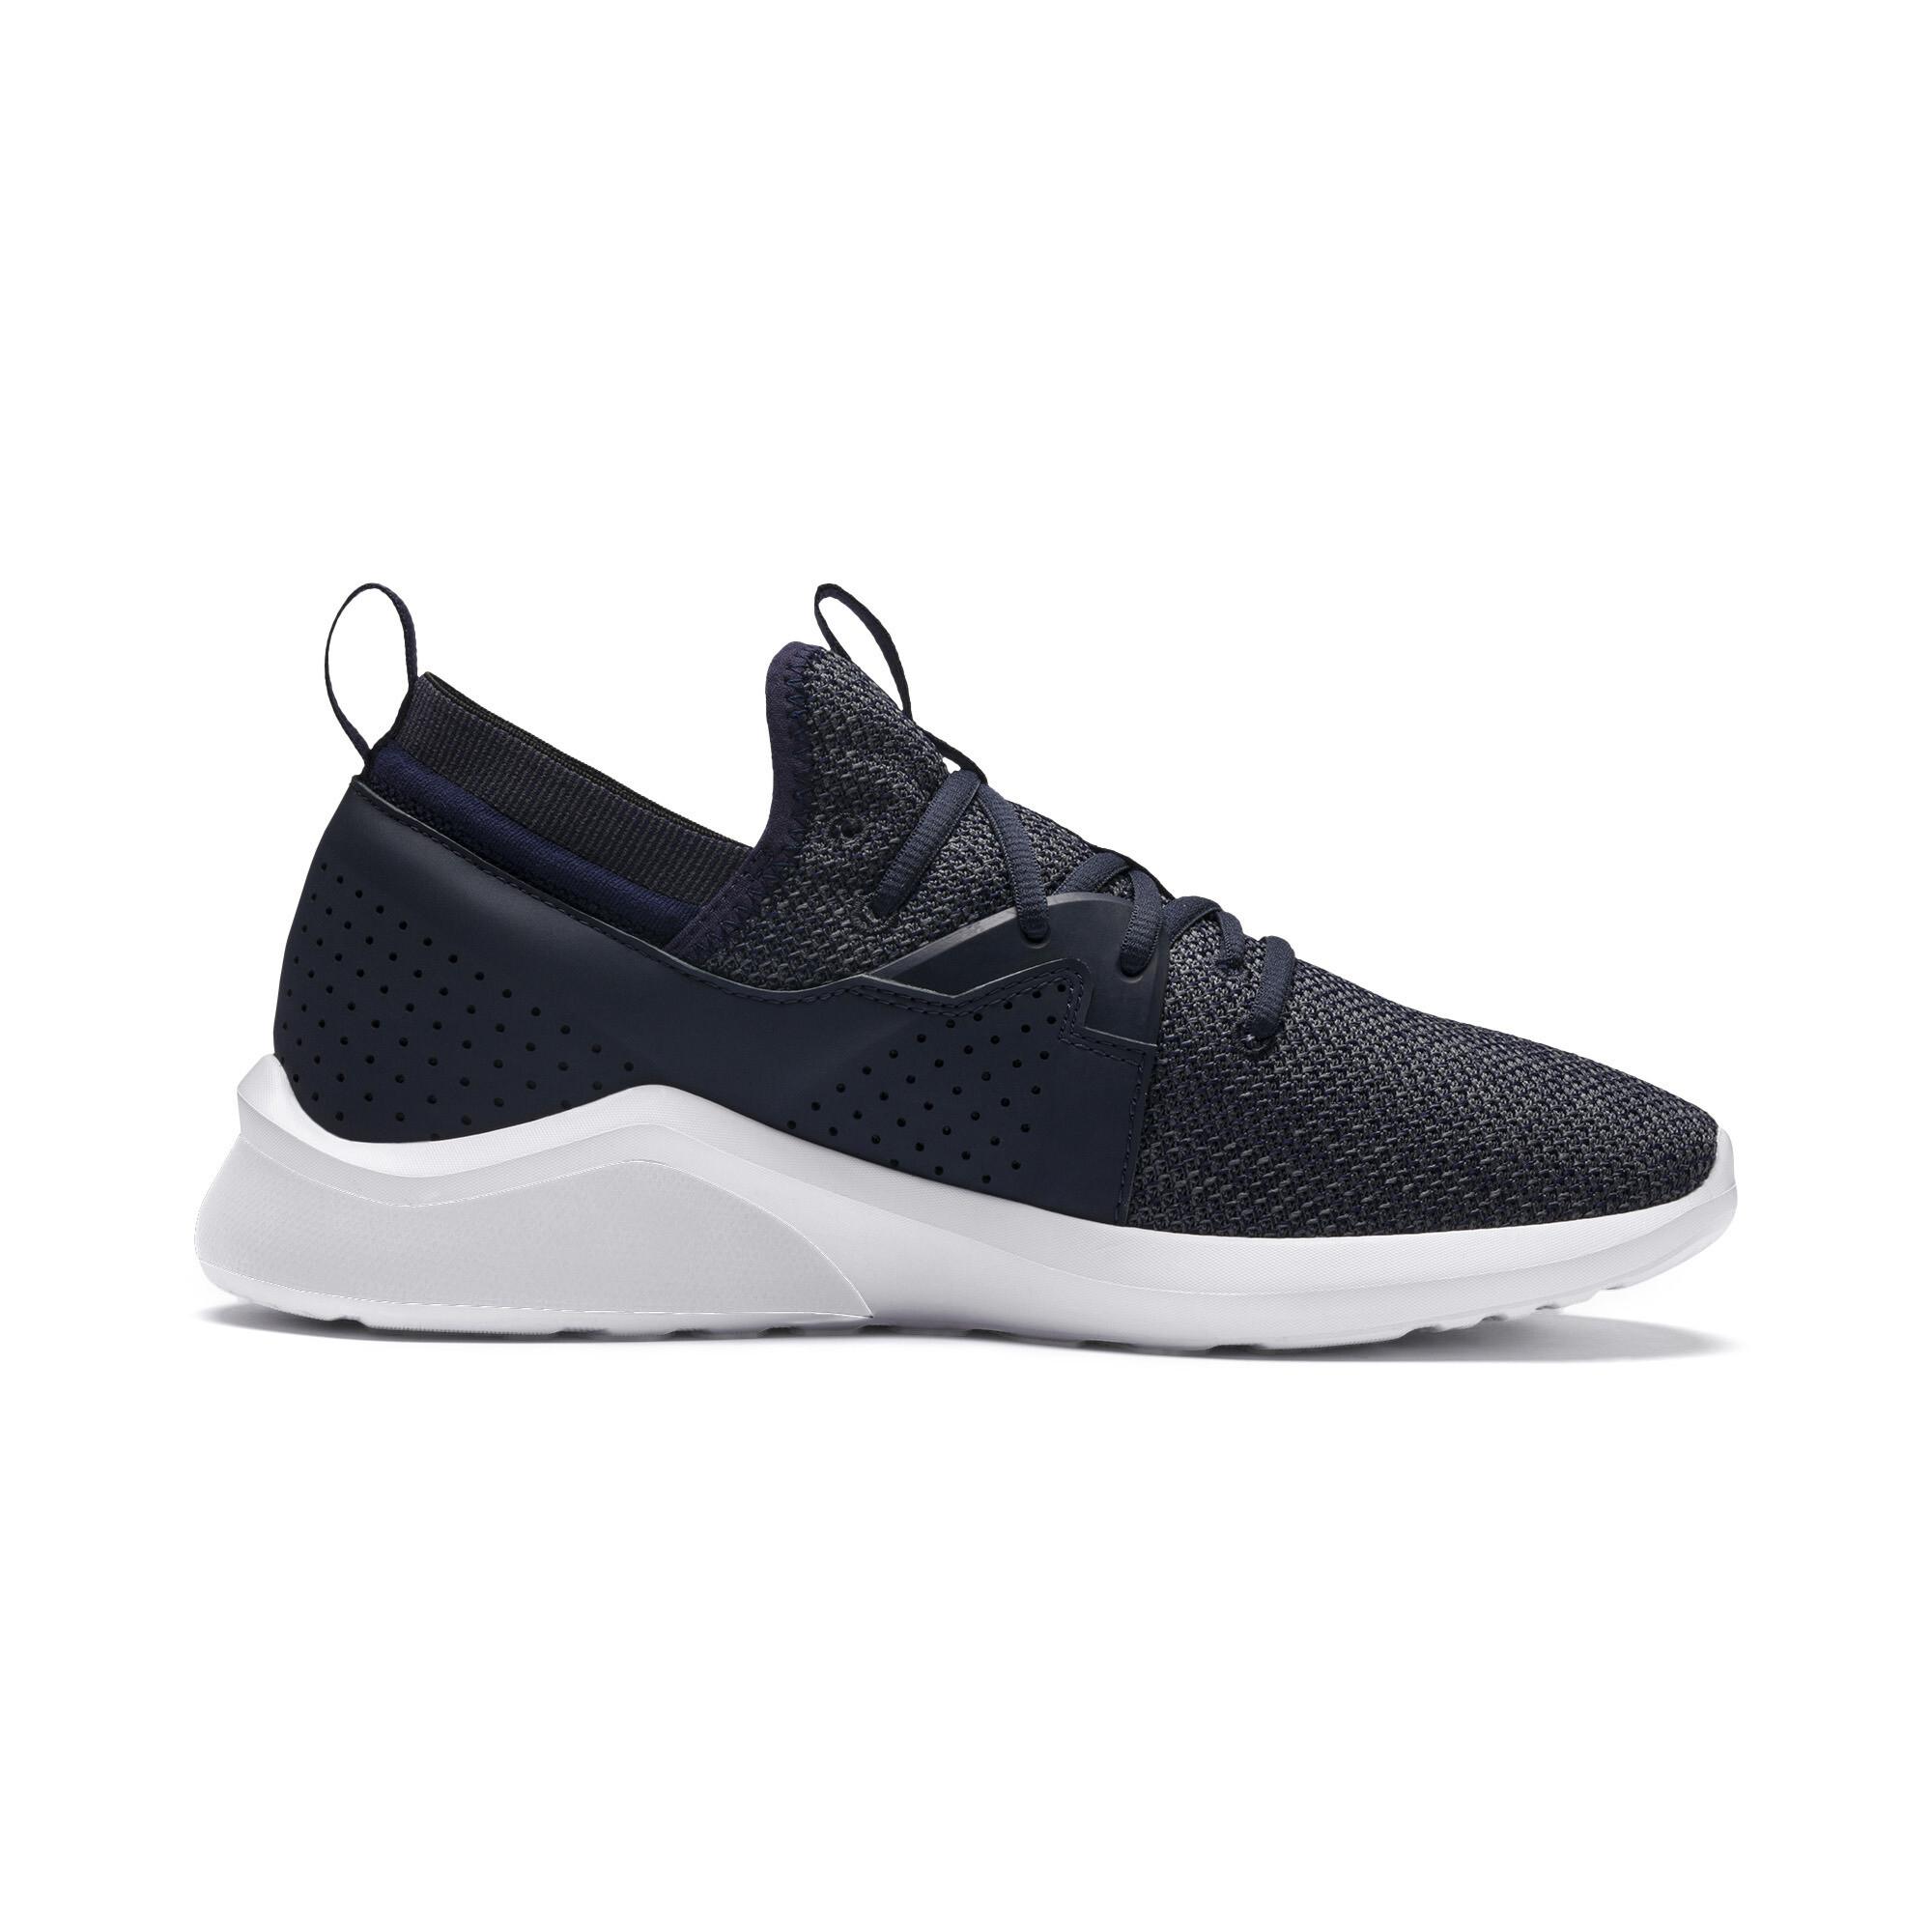 PUMA-Emergence-Men-039-s-Sneakers-Men-Shoe-Running thumbnail 12